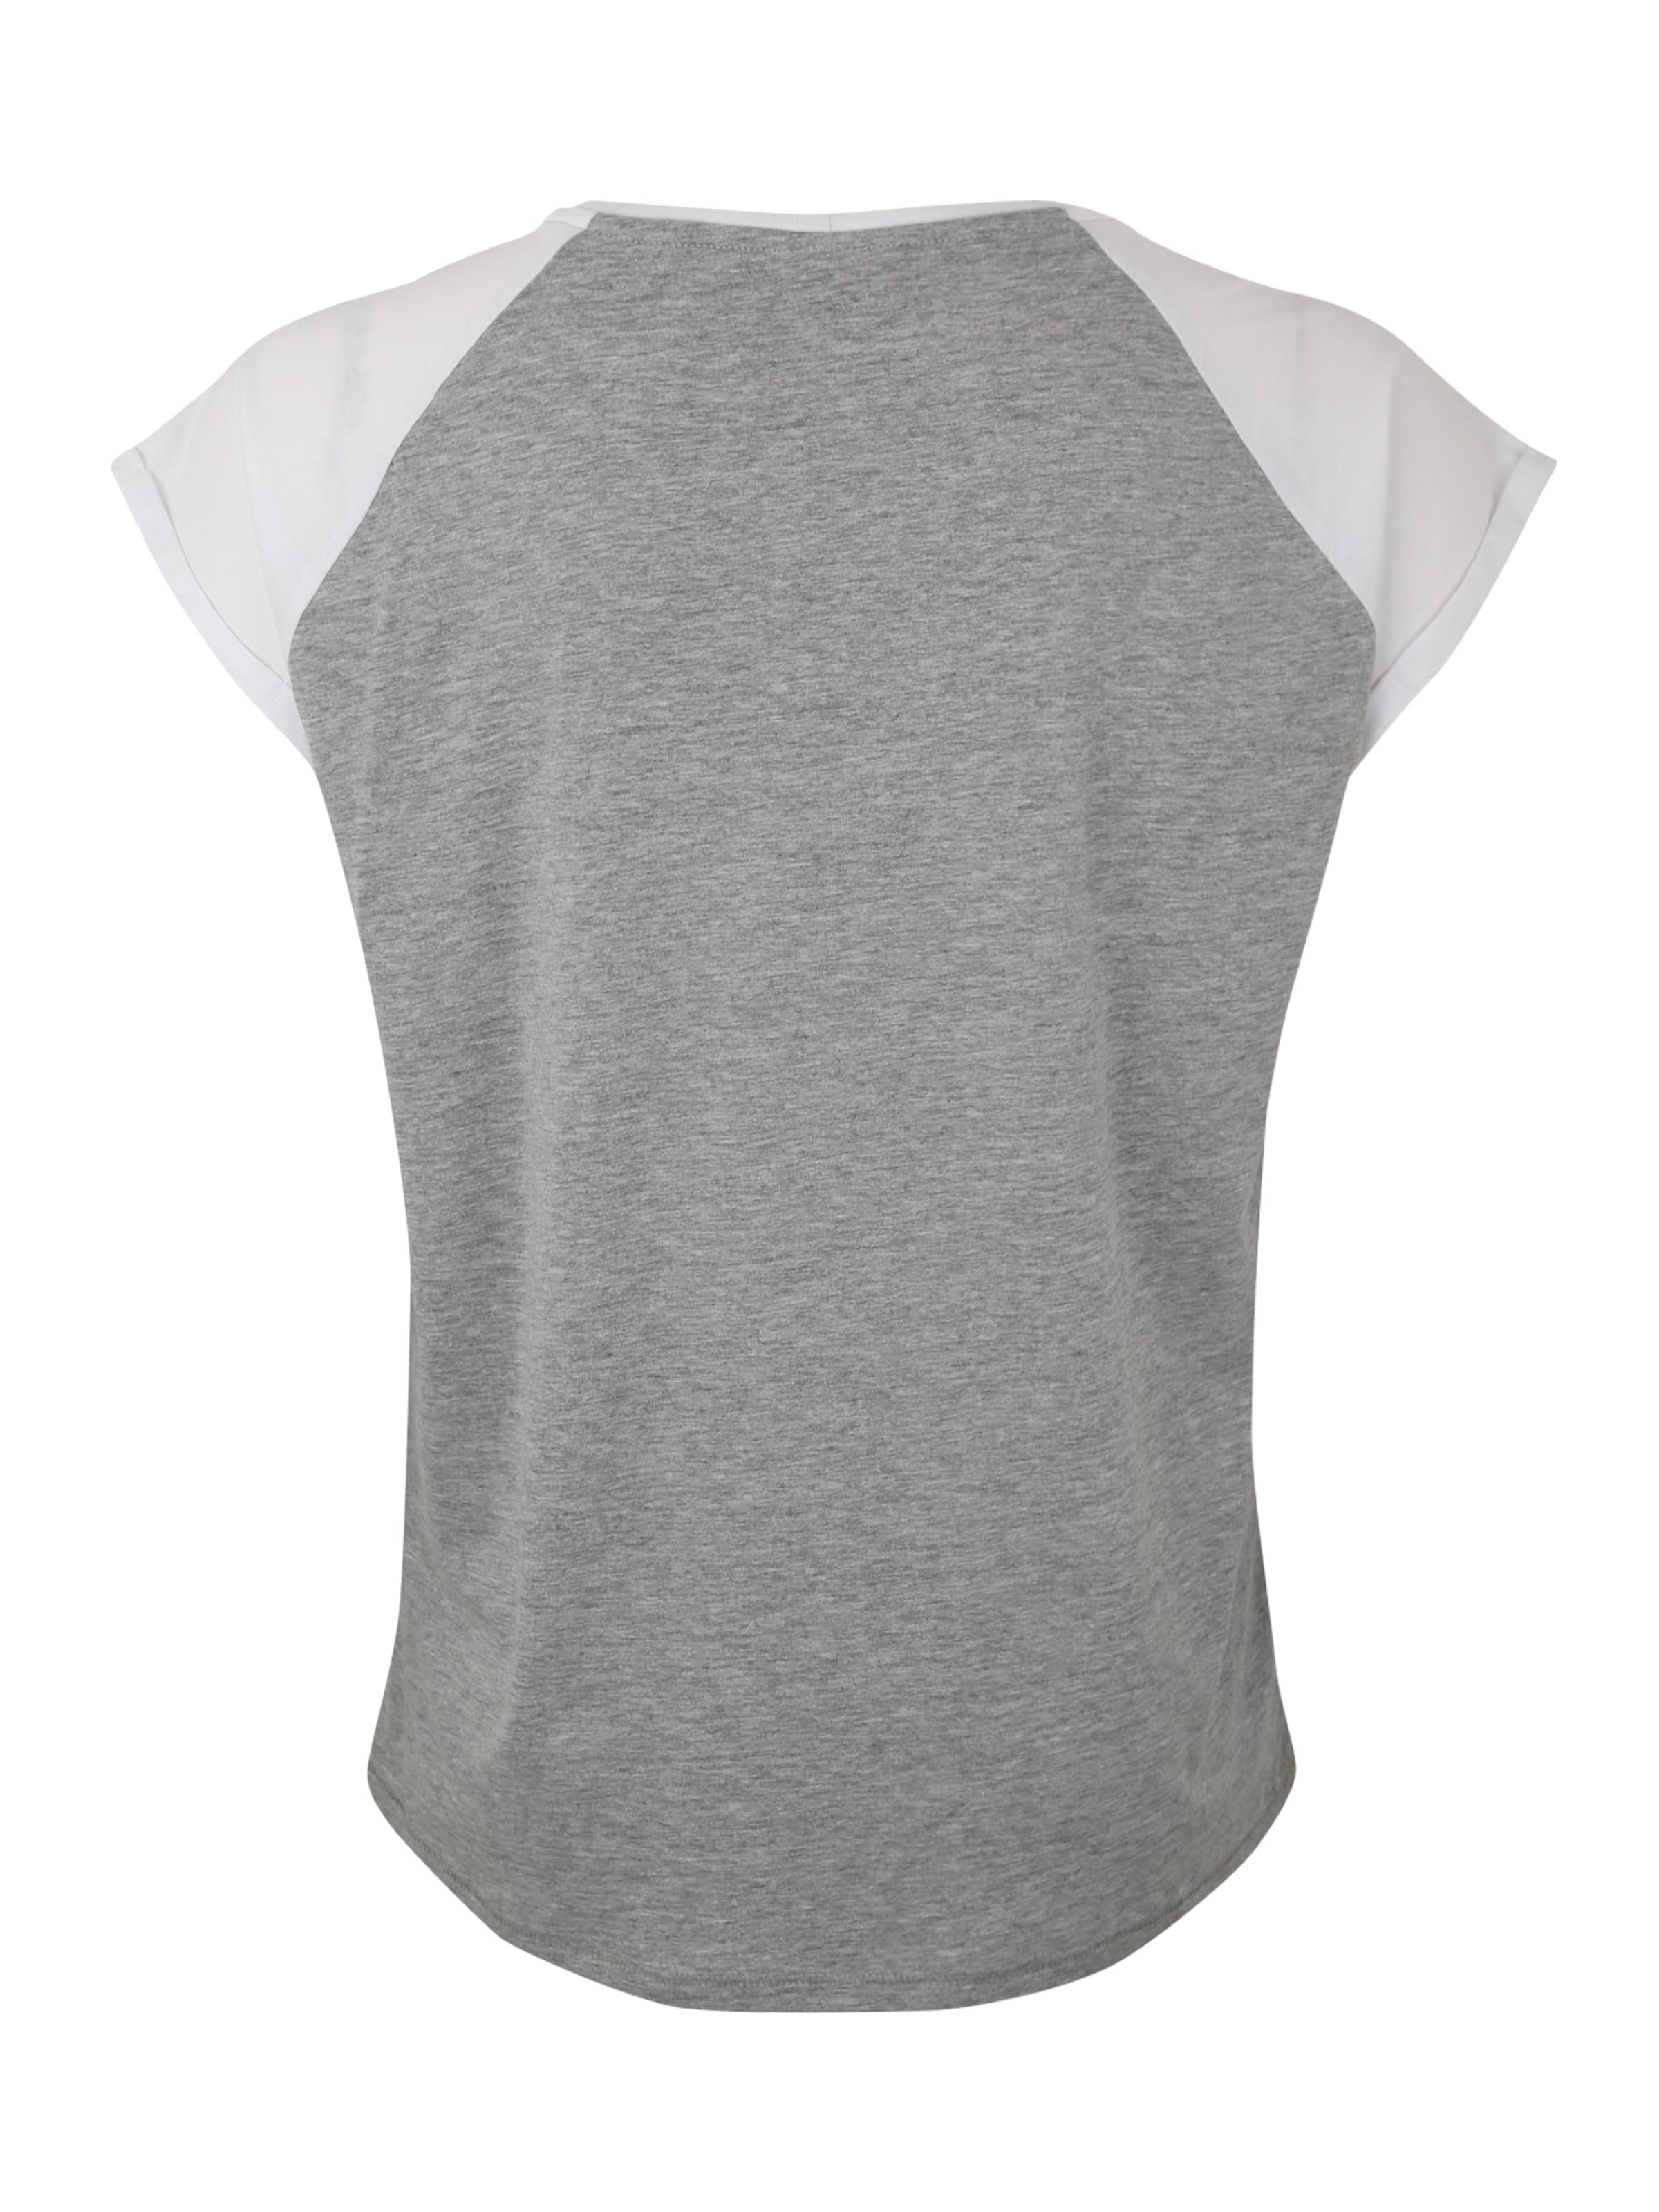 Classics 'ladies Urban In Curvy Tee' Raglan Shirt Contrast Grau gy7Ib6Yfv